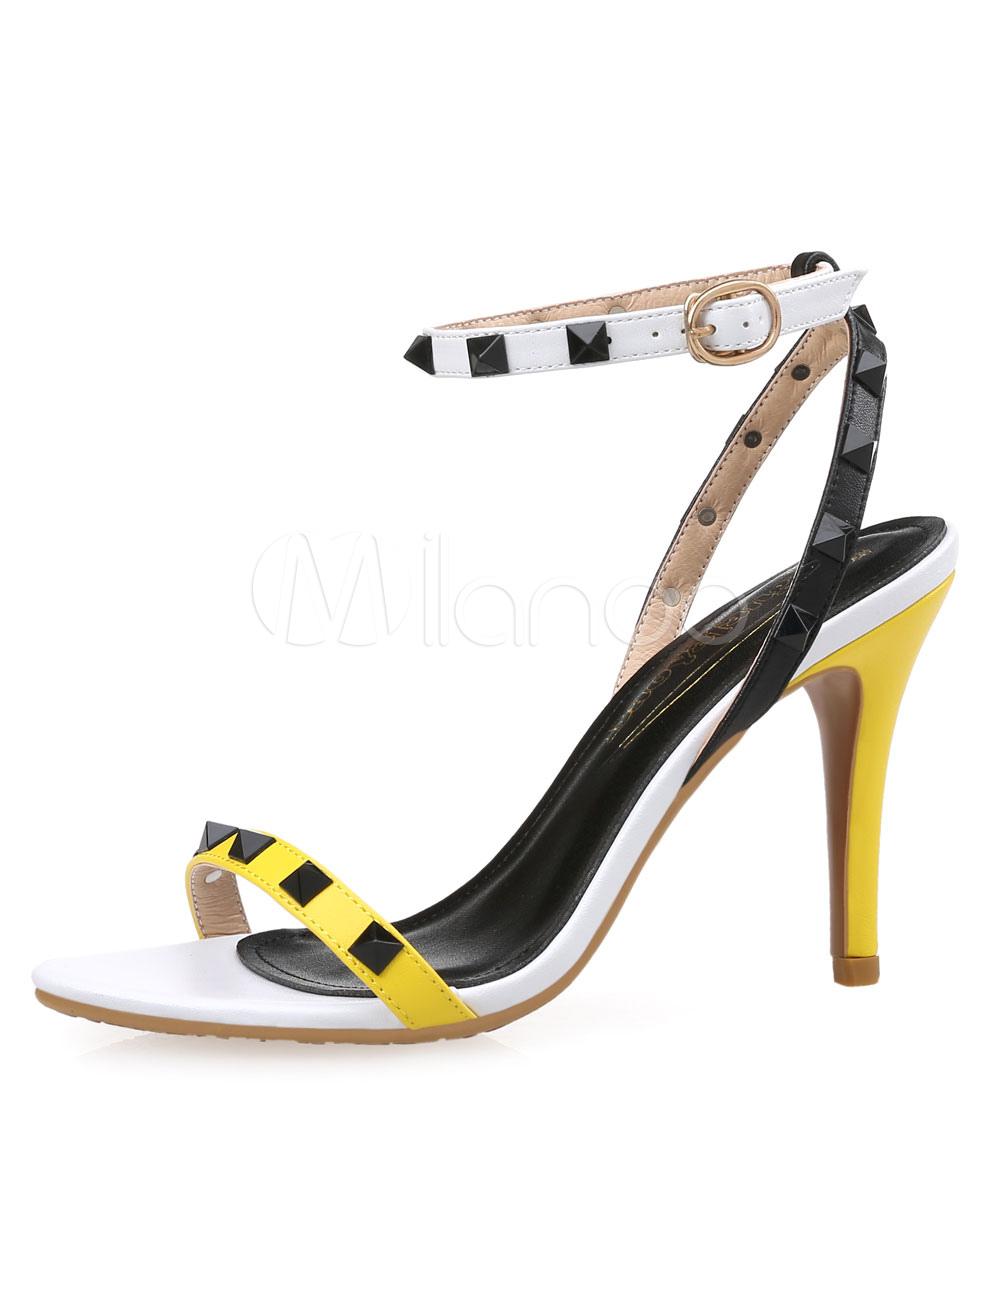 Buy Yellow Stud Sandals Straps PU Heels for Women for $37.99 in Milanoo store